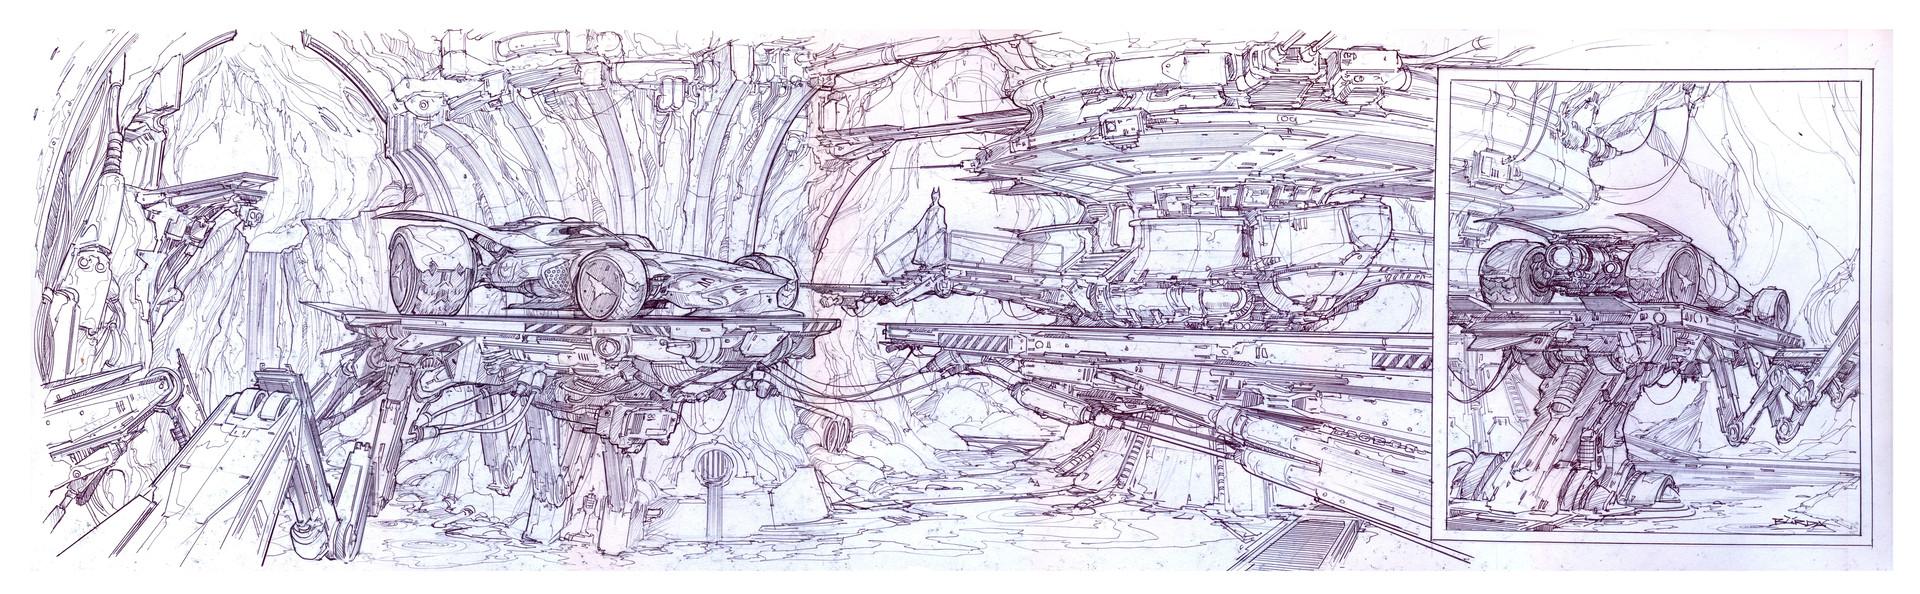 Alejandro burdisio baticueva boceto